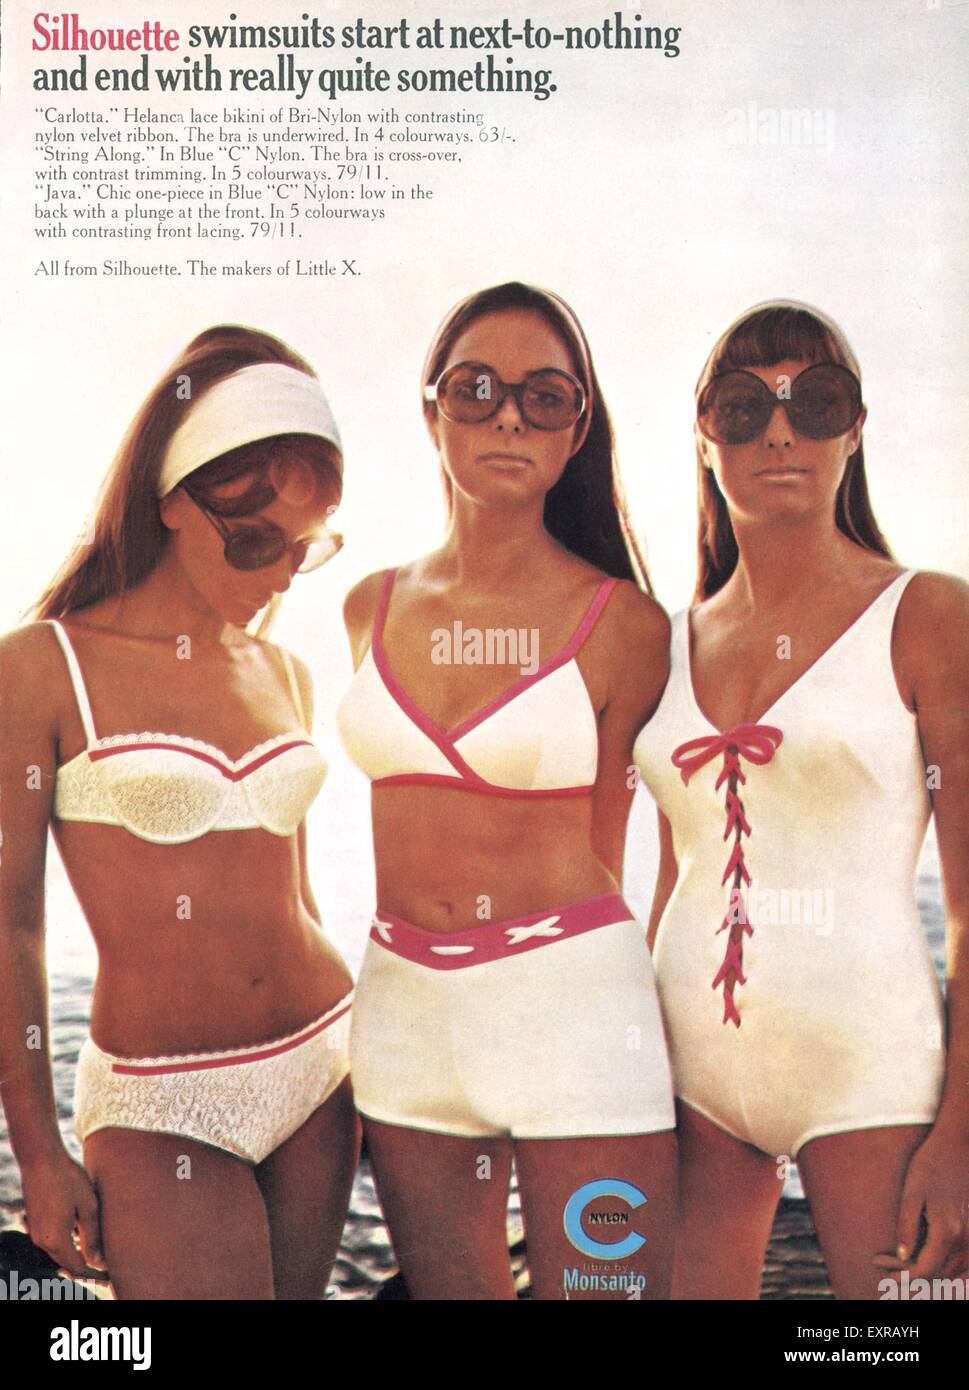 1960s Uk Magazine Advert Stock Photos   1960s Uk Magazine Advert ... 6cbba100d